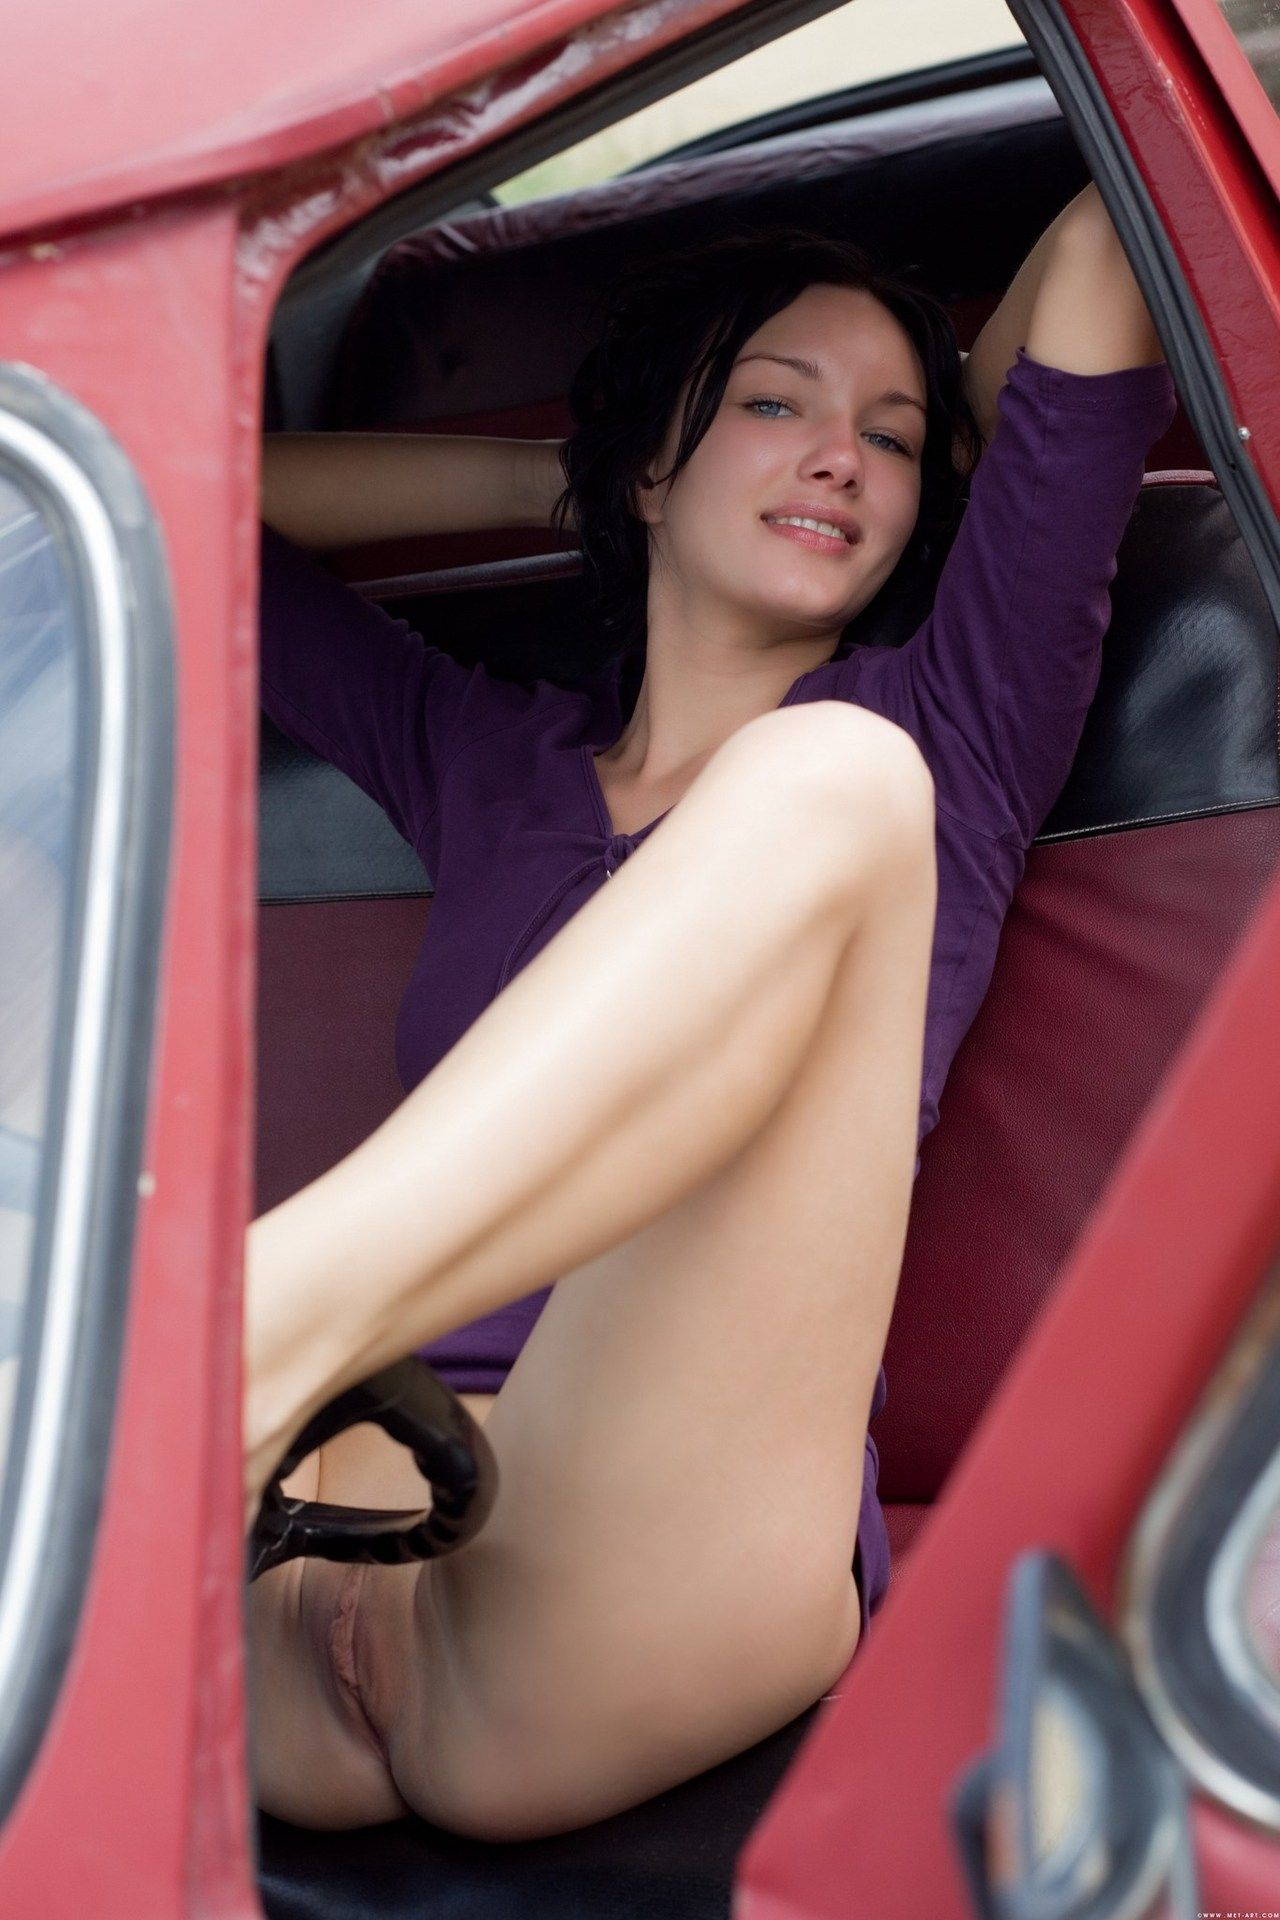 Pantyless girl